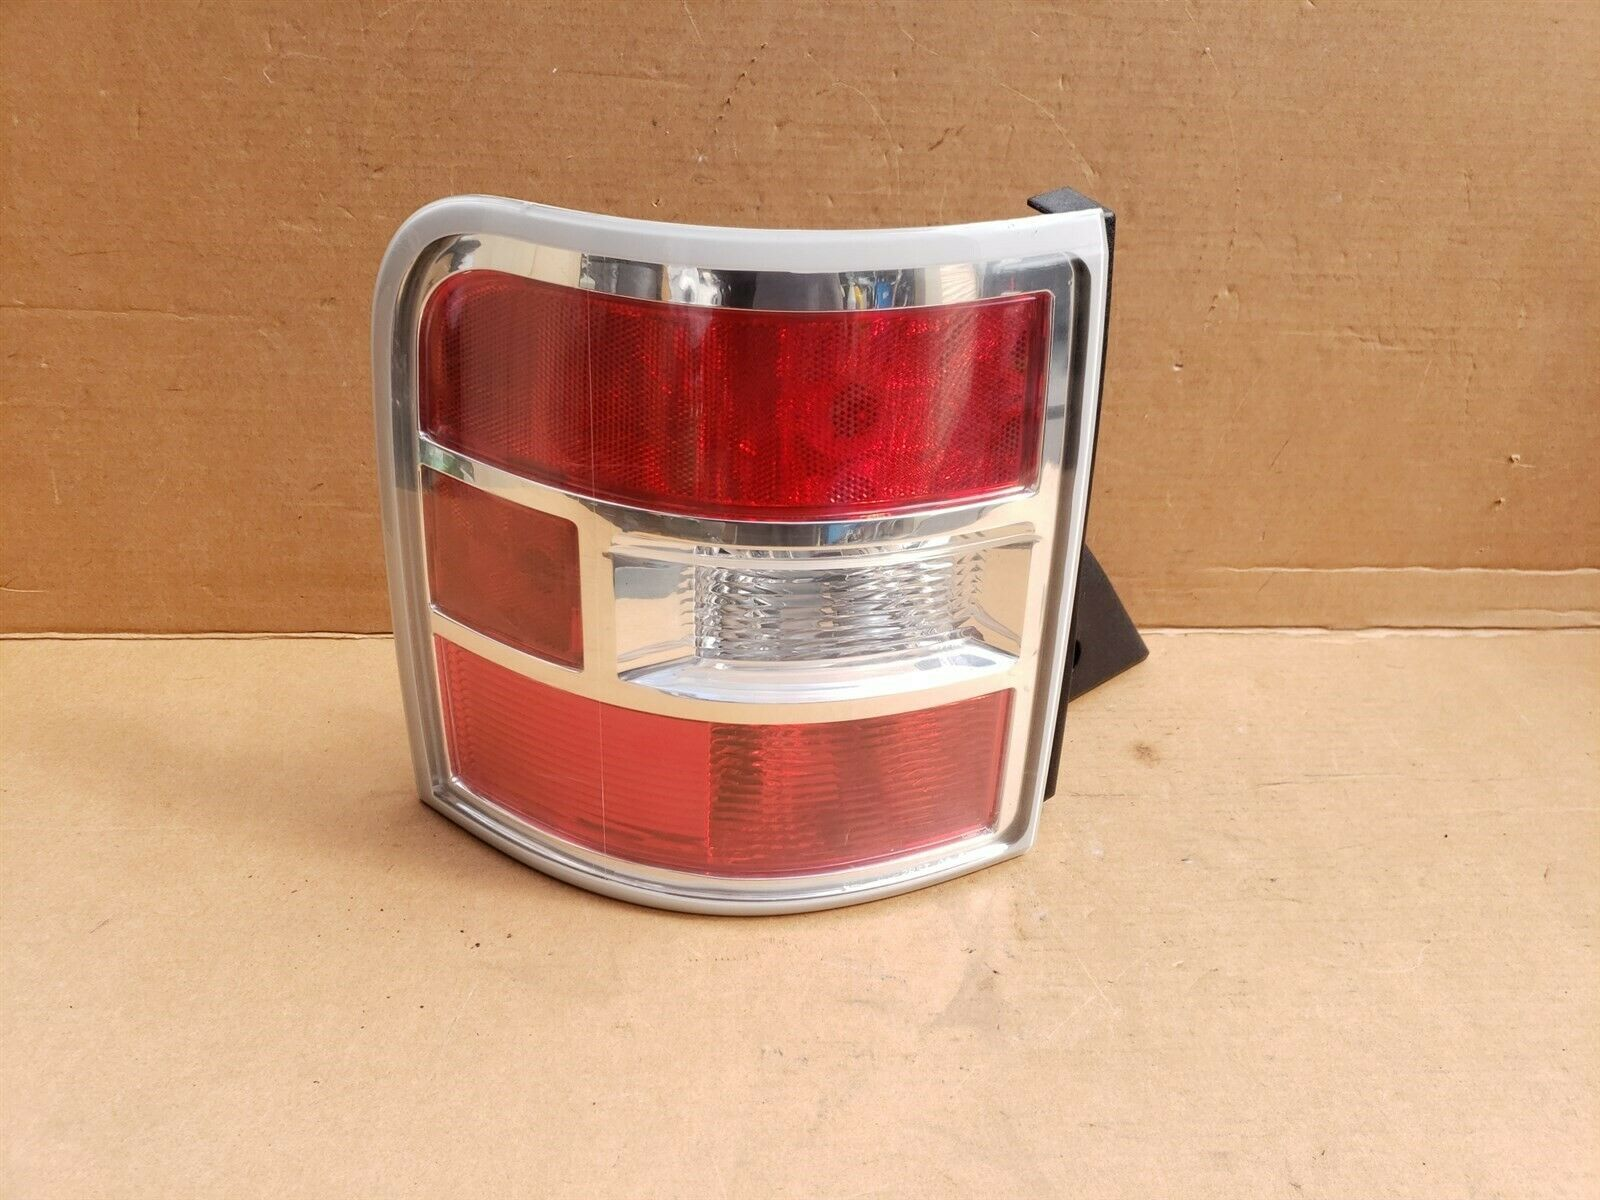 09-11 Ford Flex Taillight Combination Brake Light Lamp Driver Left LH (NON LED)